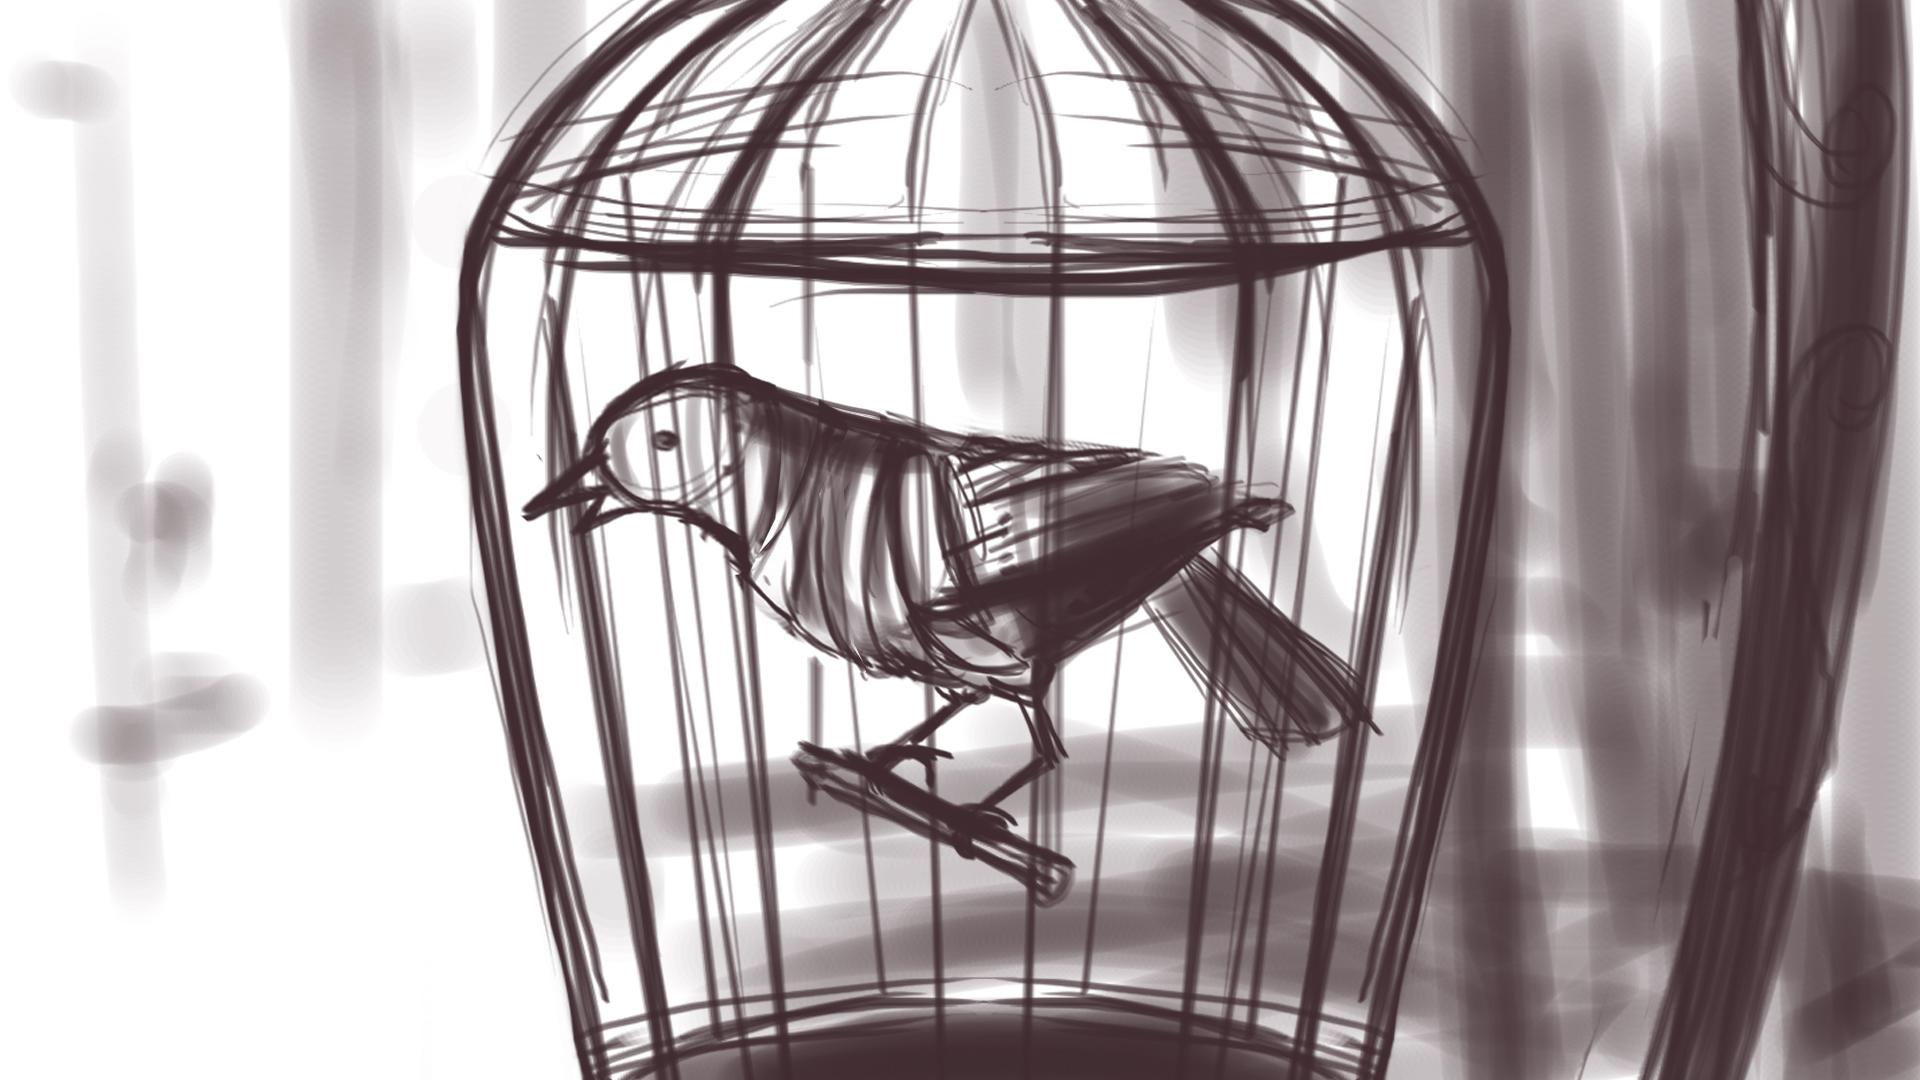 Ana_Lovelace_SB rough_bird cage03jpg.jpg